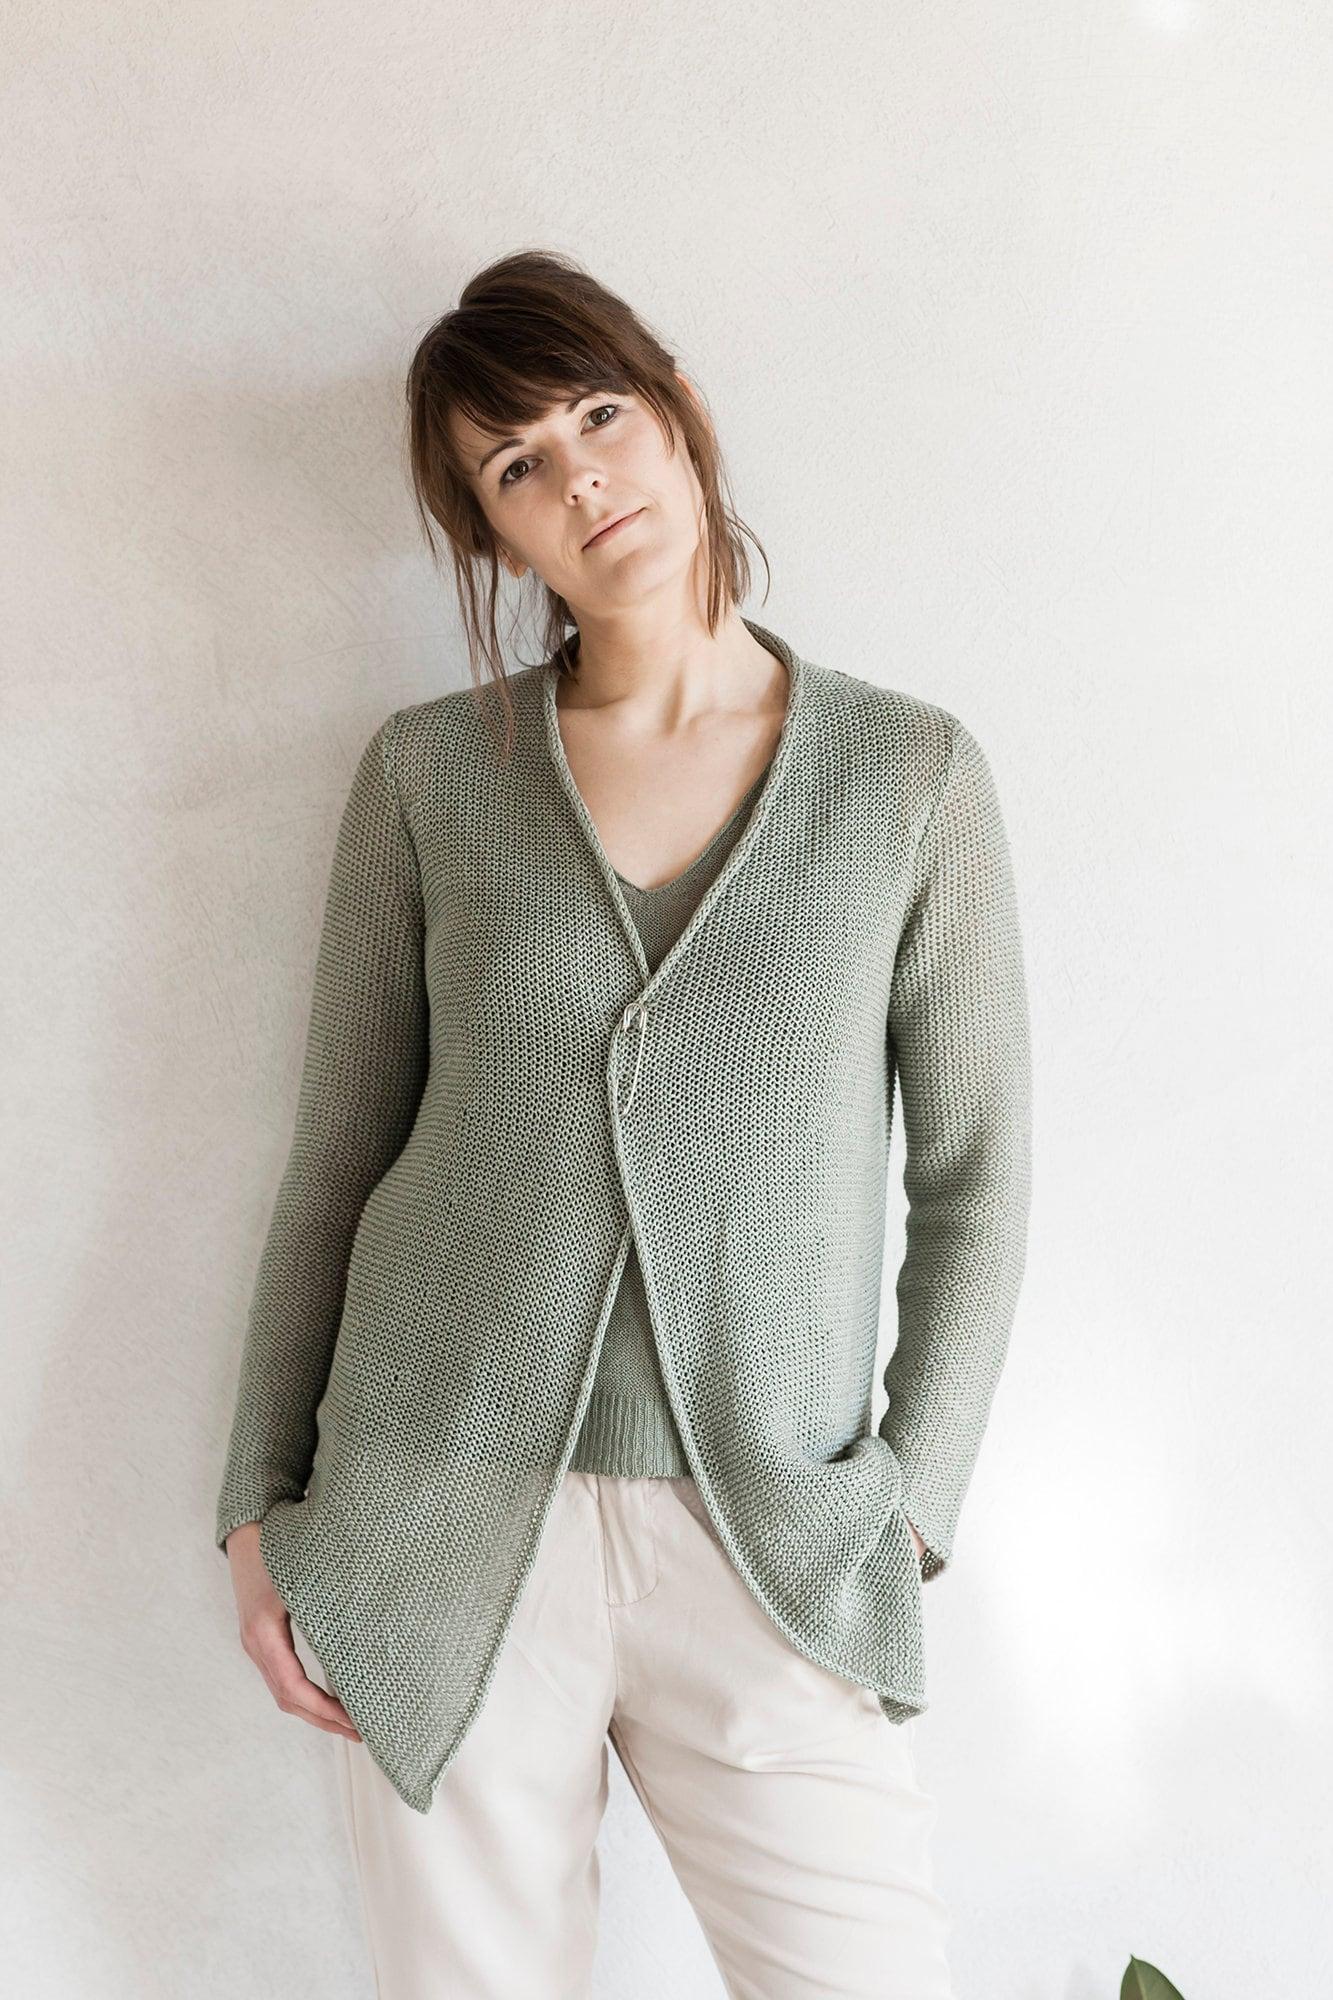 03e2cac1c0 Linen wrap cardigan Knitted linen sweater Linen summer | Etsy